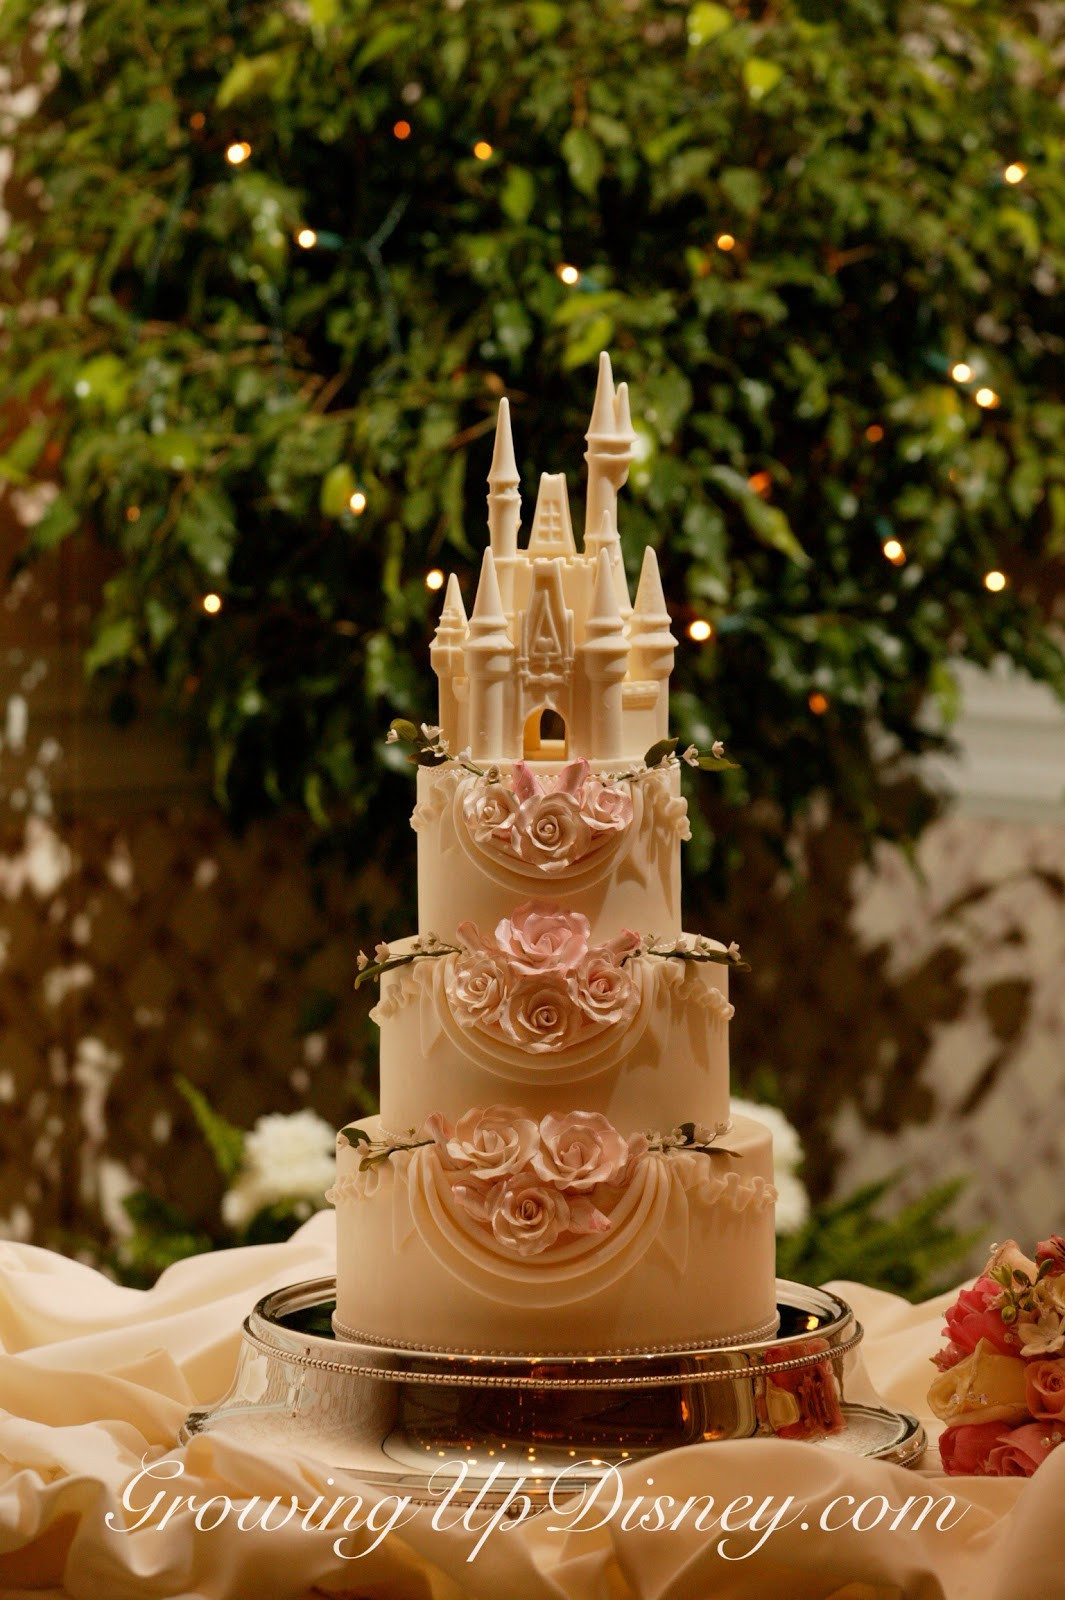 Princess Wedding Cakes  Growing Up Disney Disney s Fairy Tale Weddings s